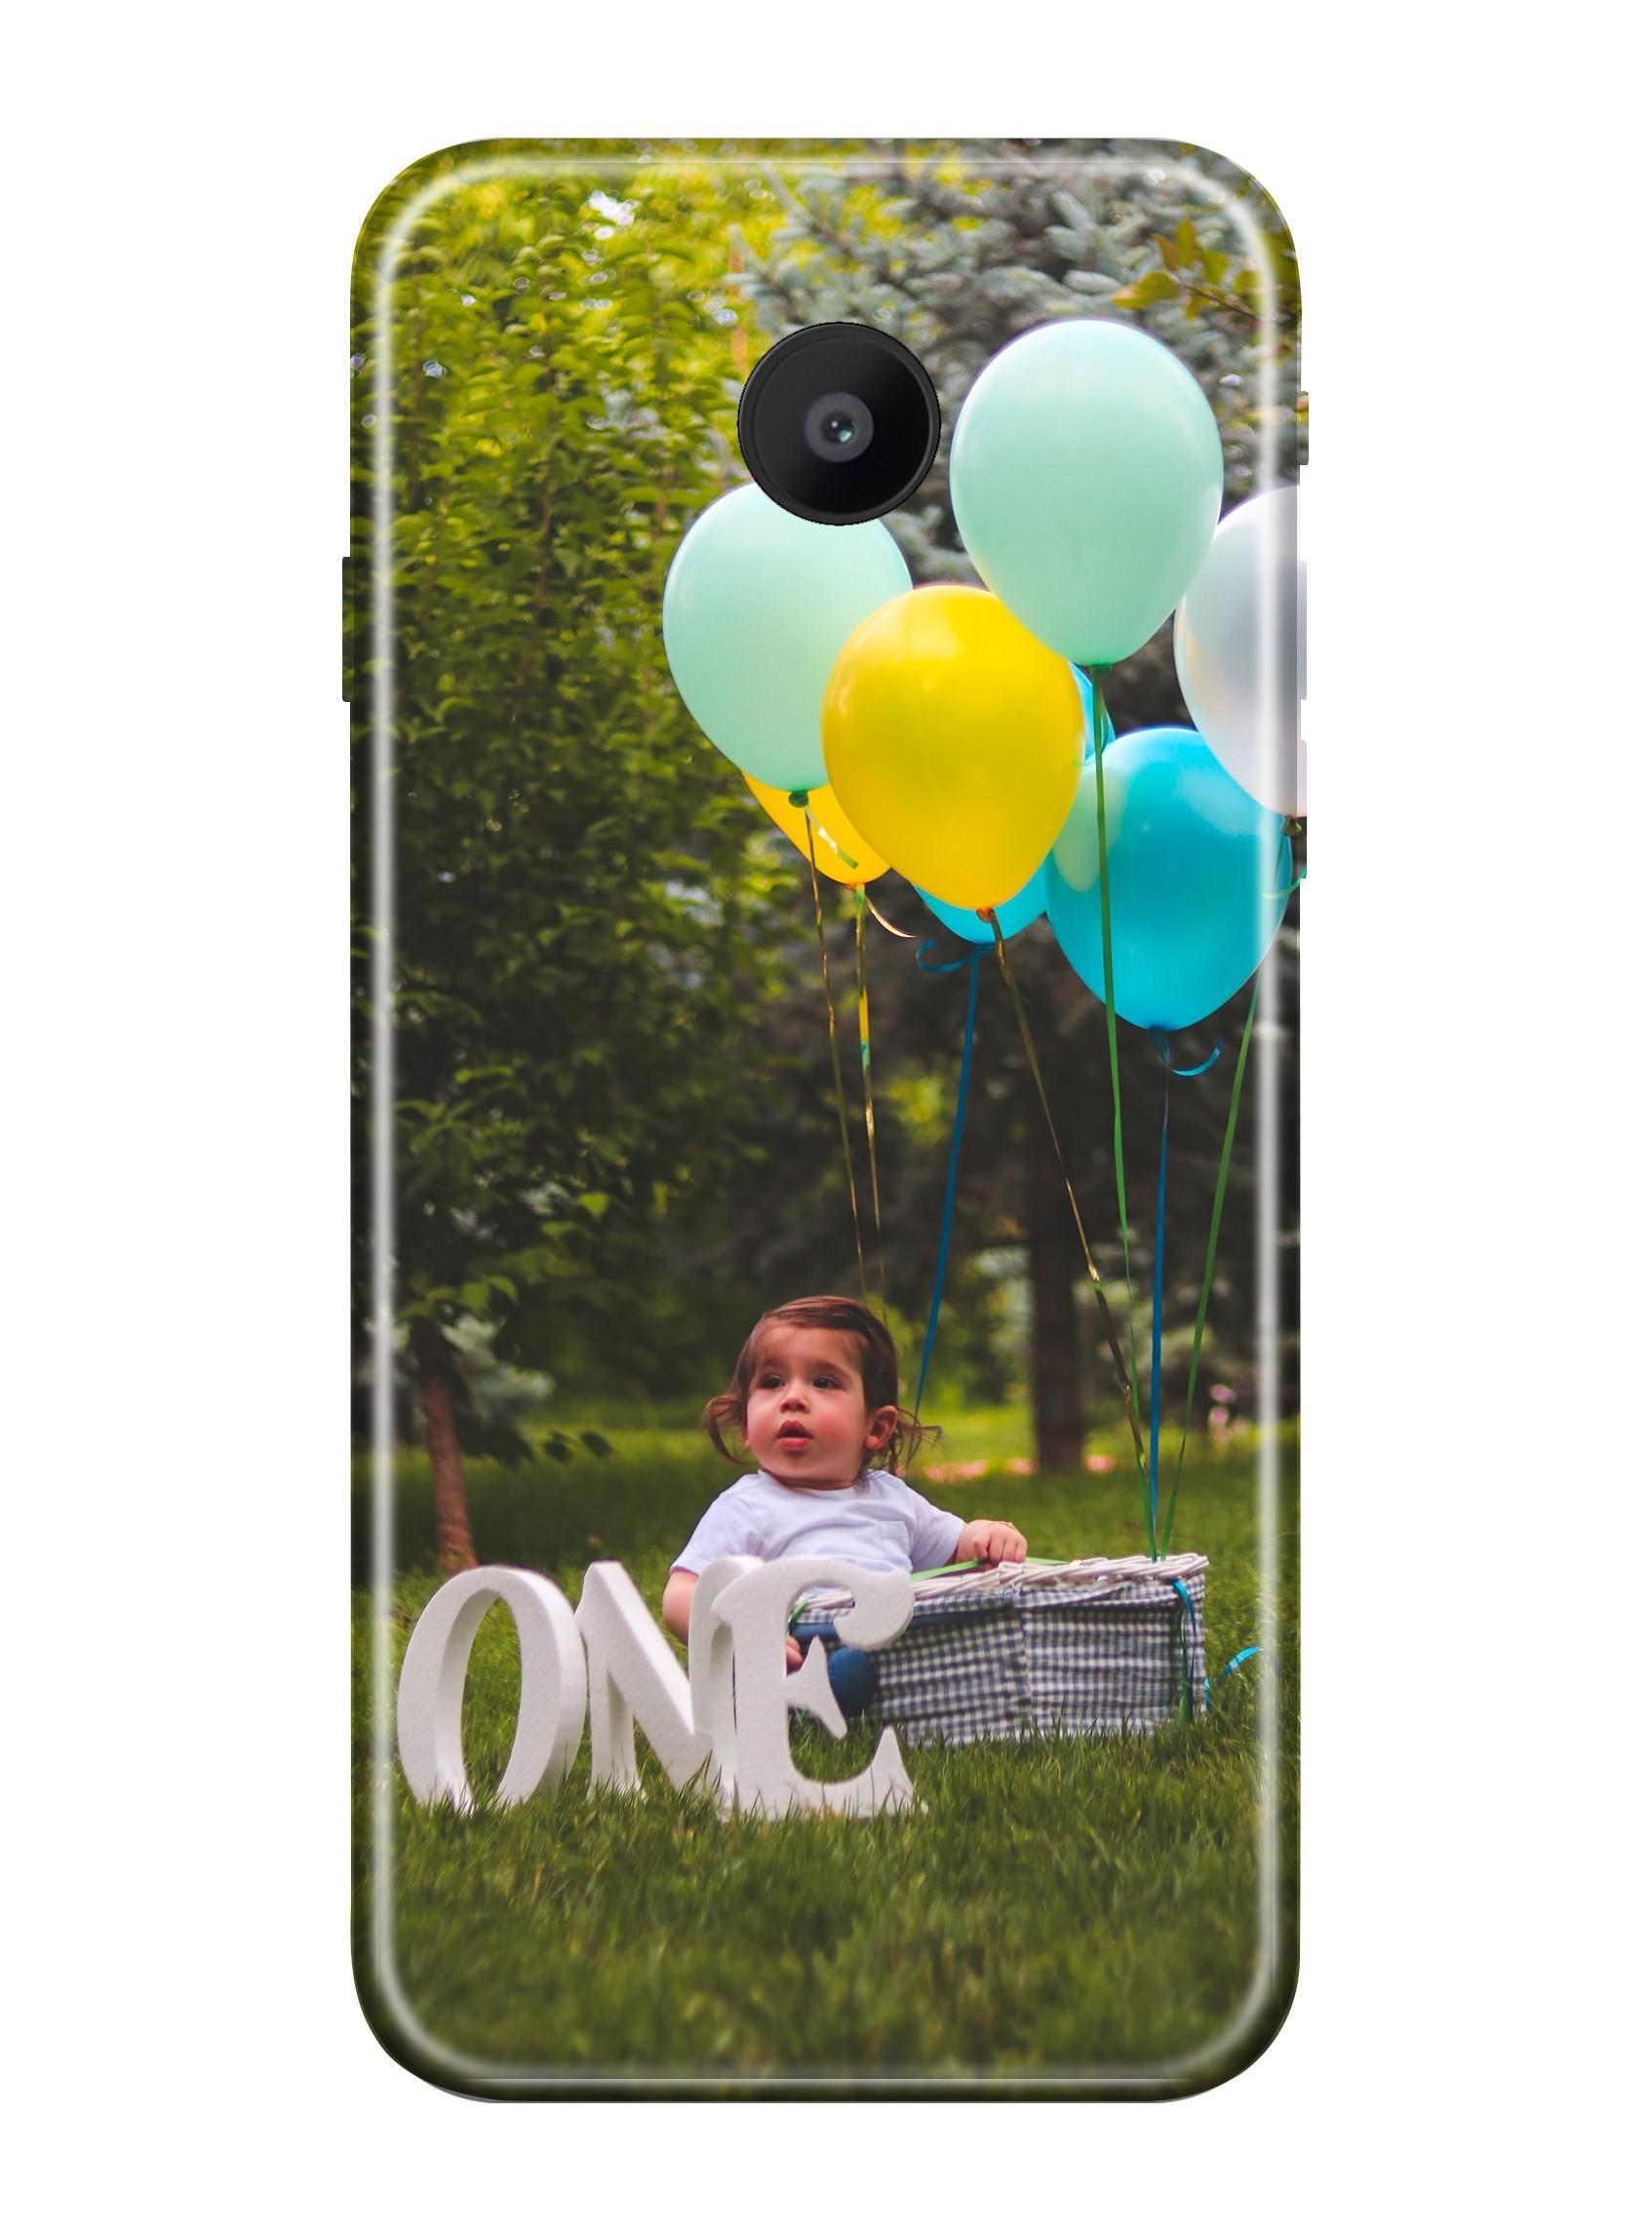 Personalised Case for LG Nexus 6